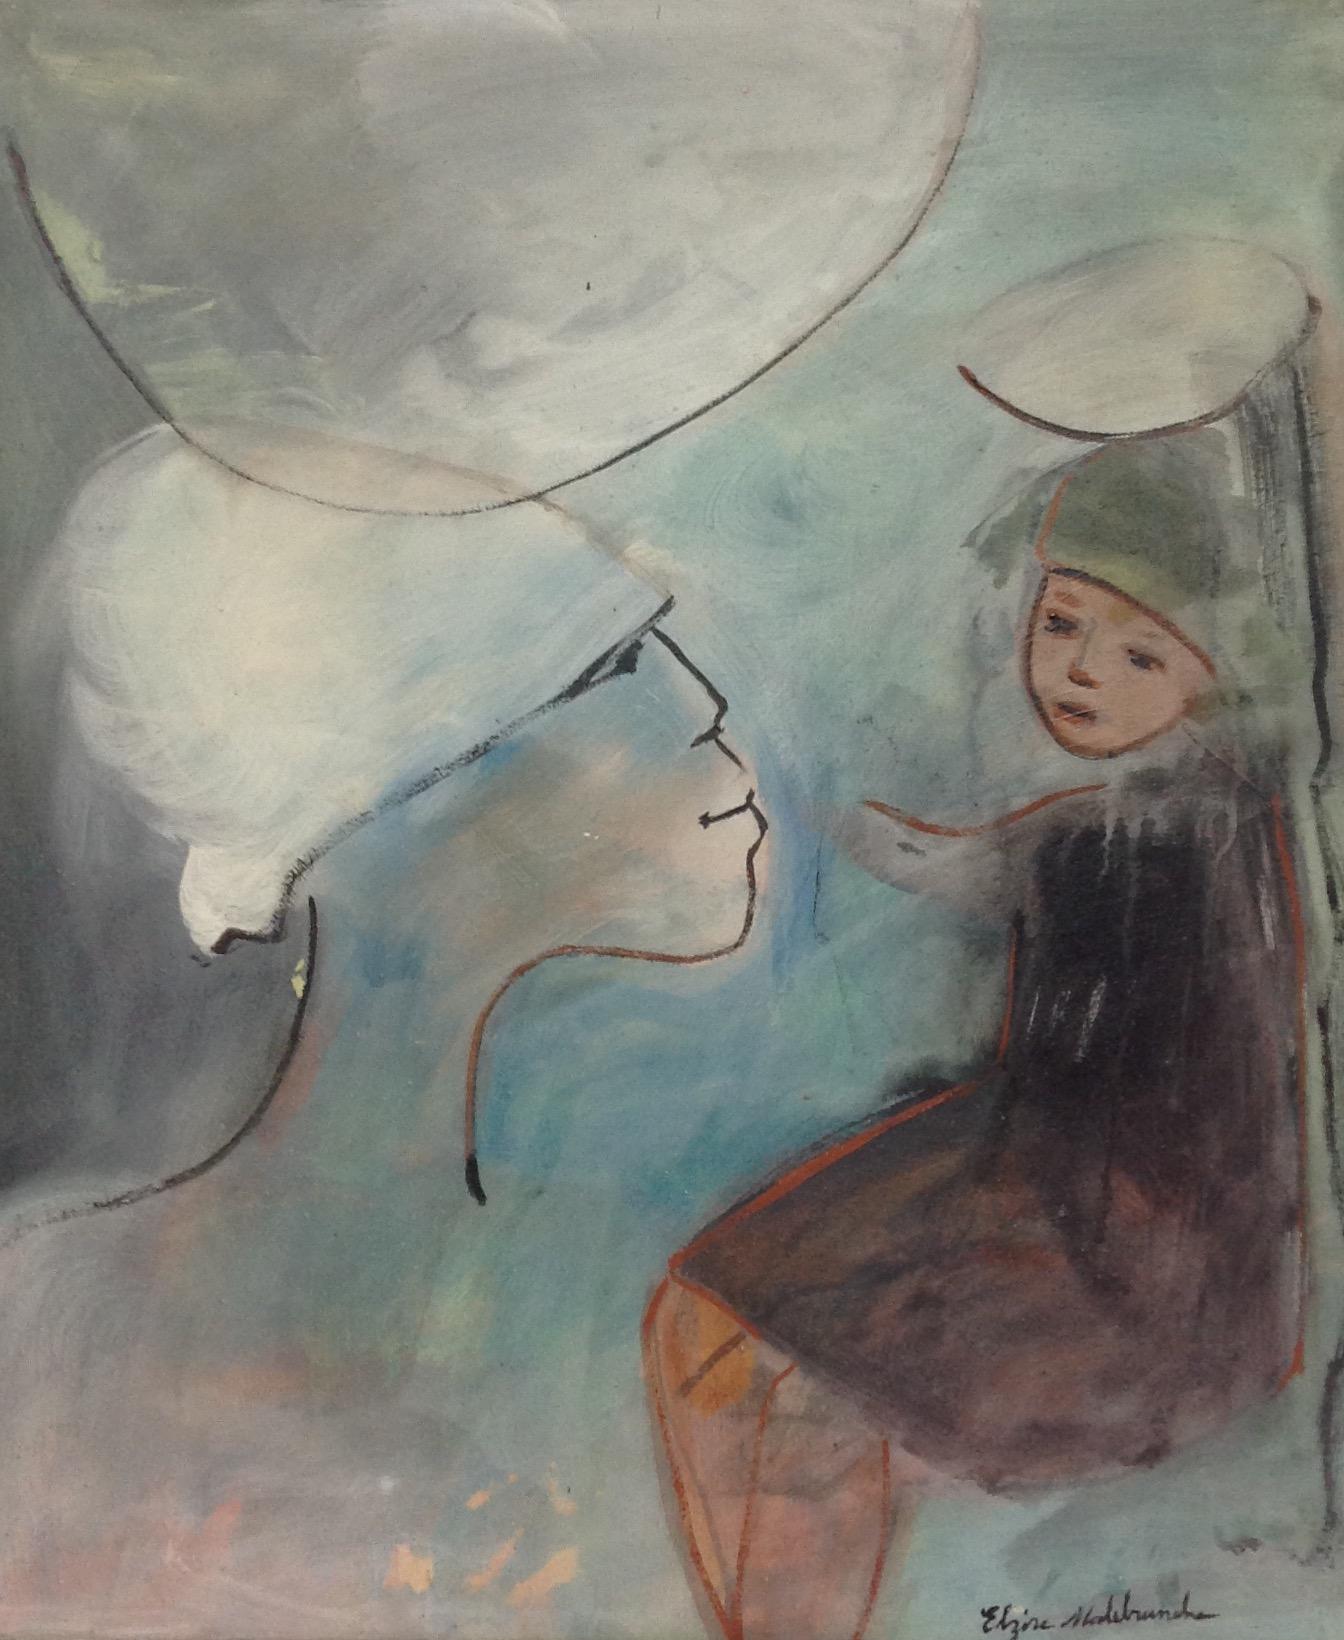 Malebranche Elzire  24X20 #20-3-96 canvas